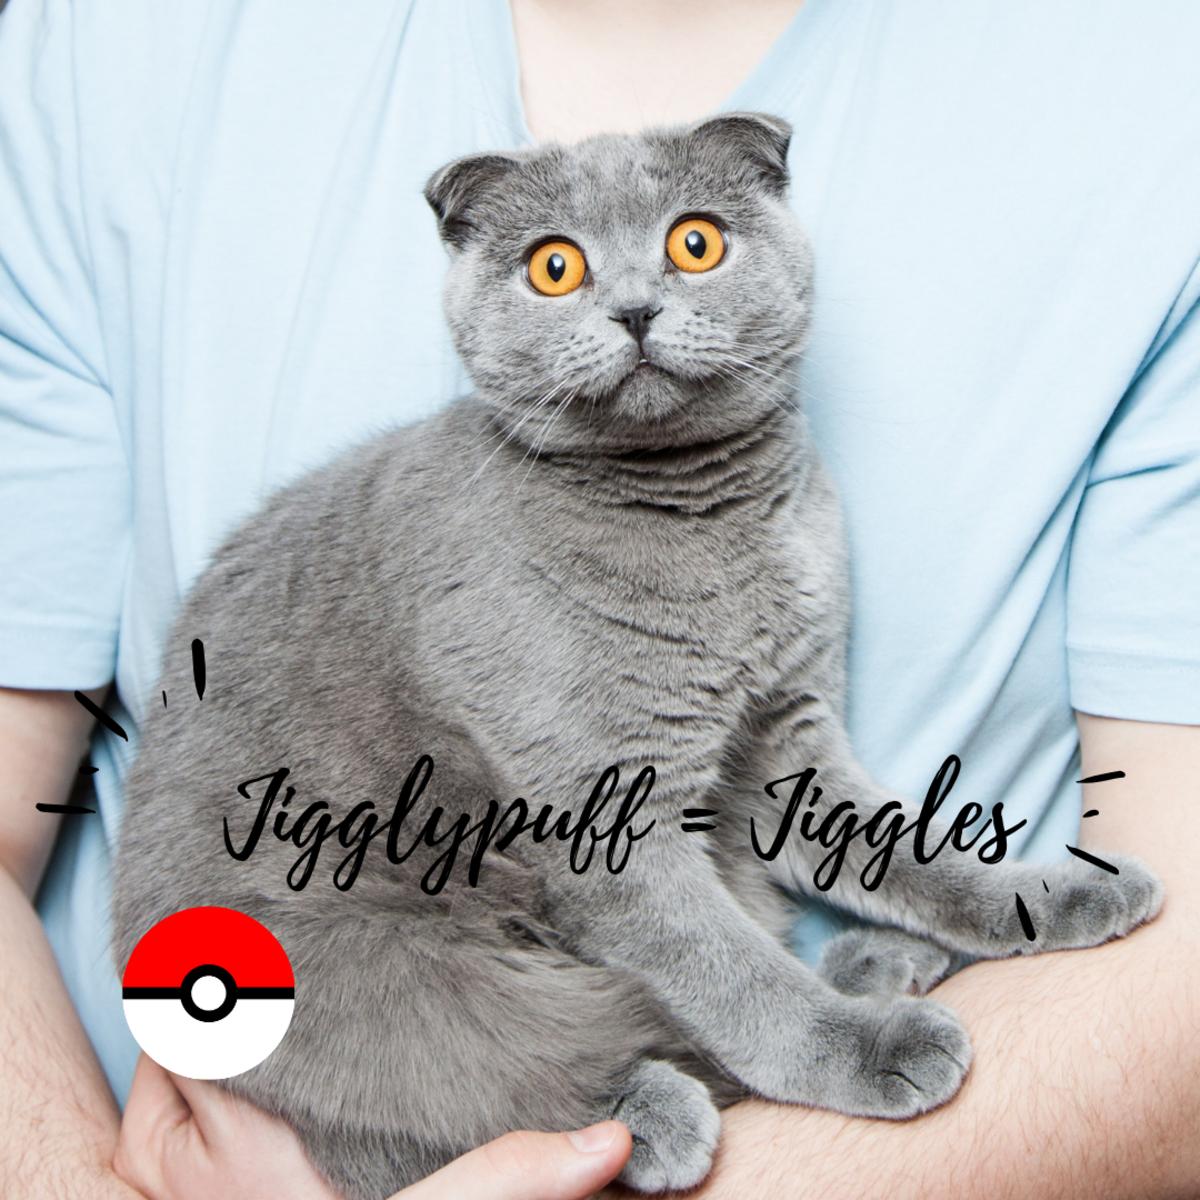 Jigglypuff or Jiggles